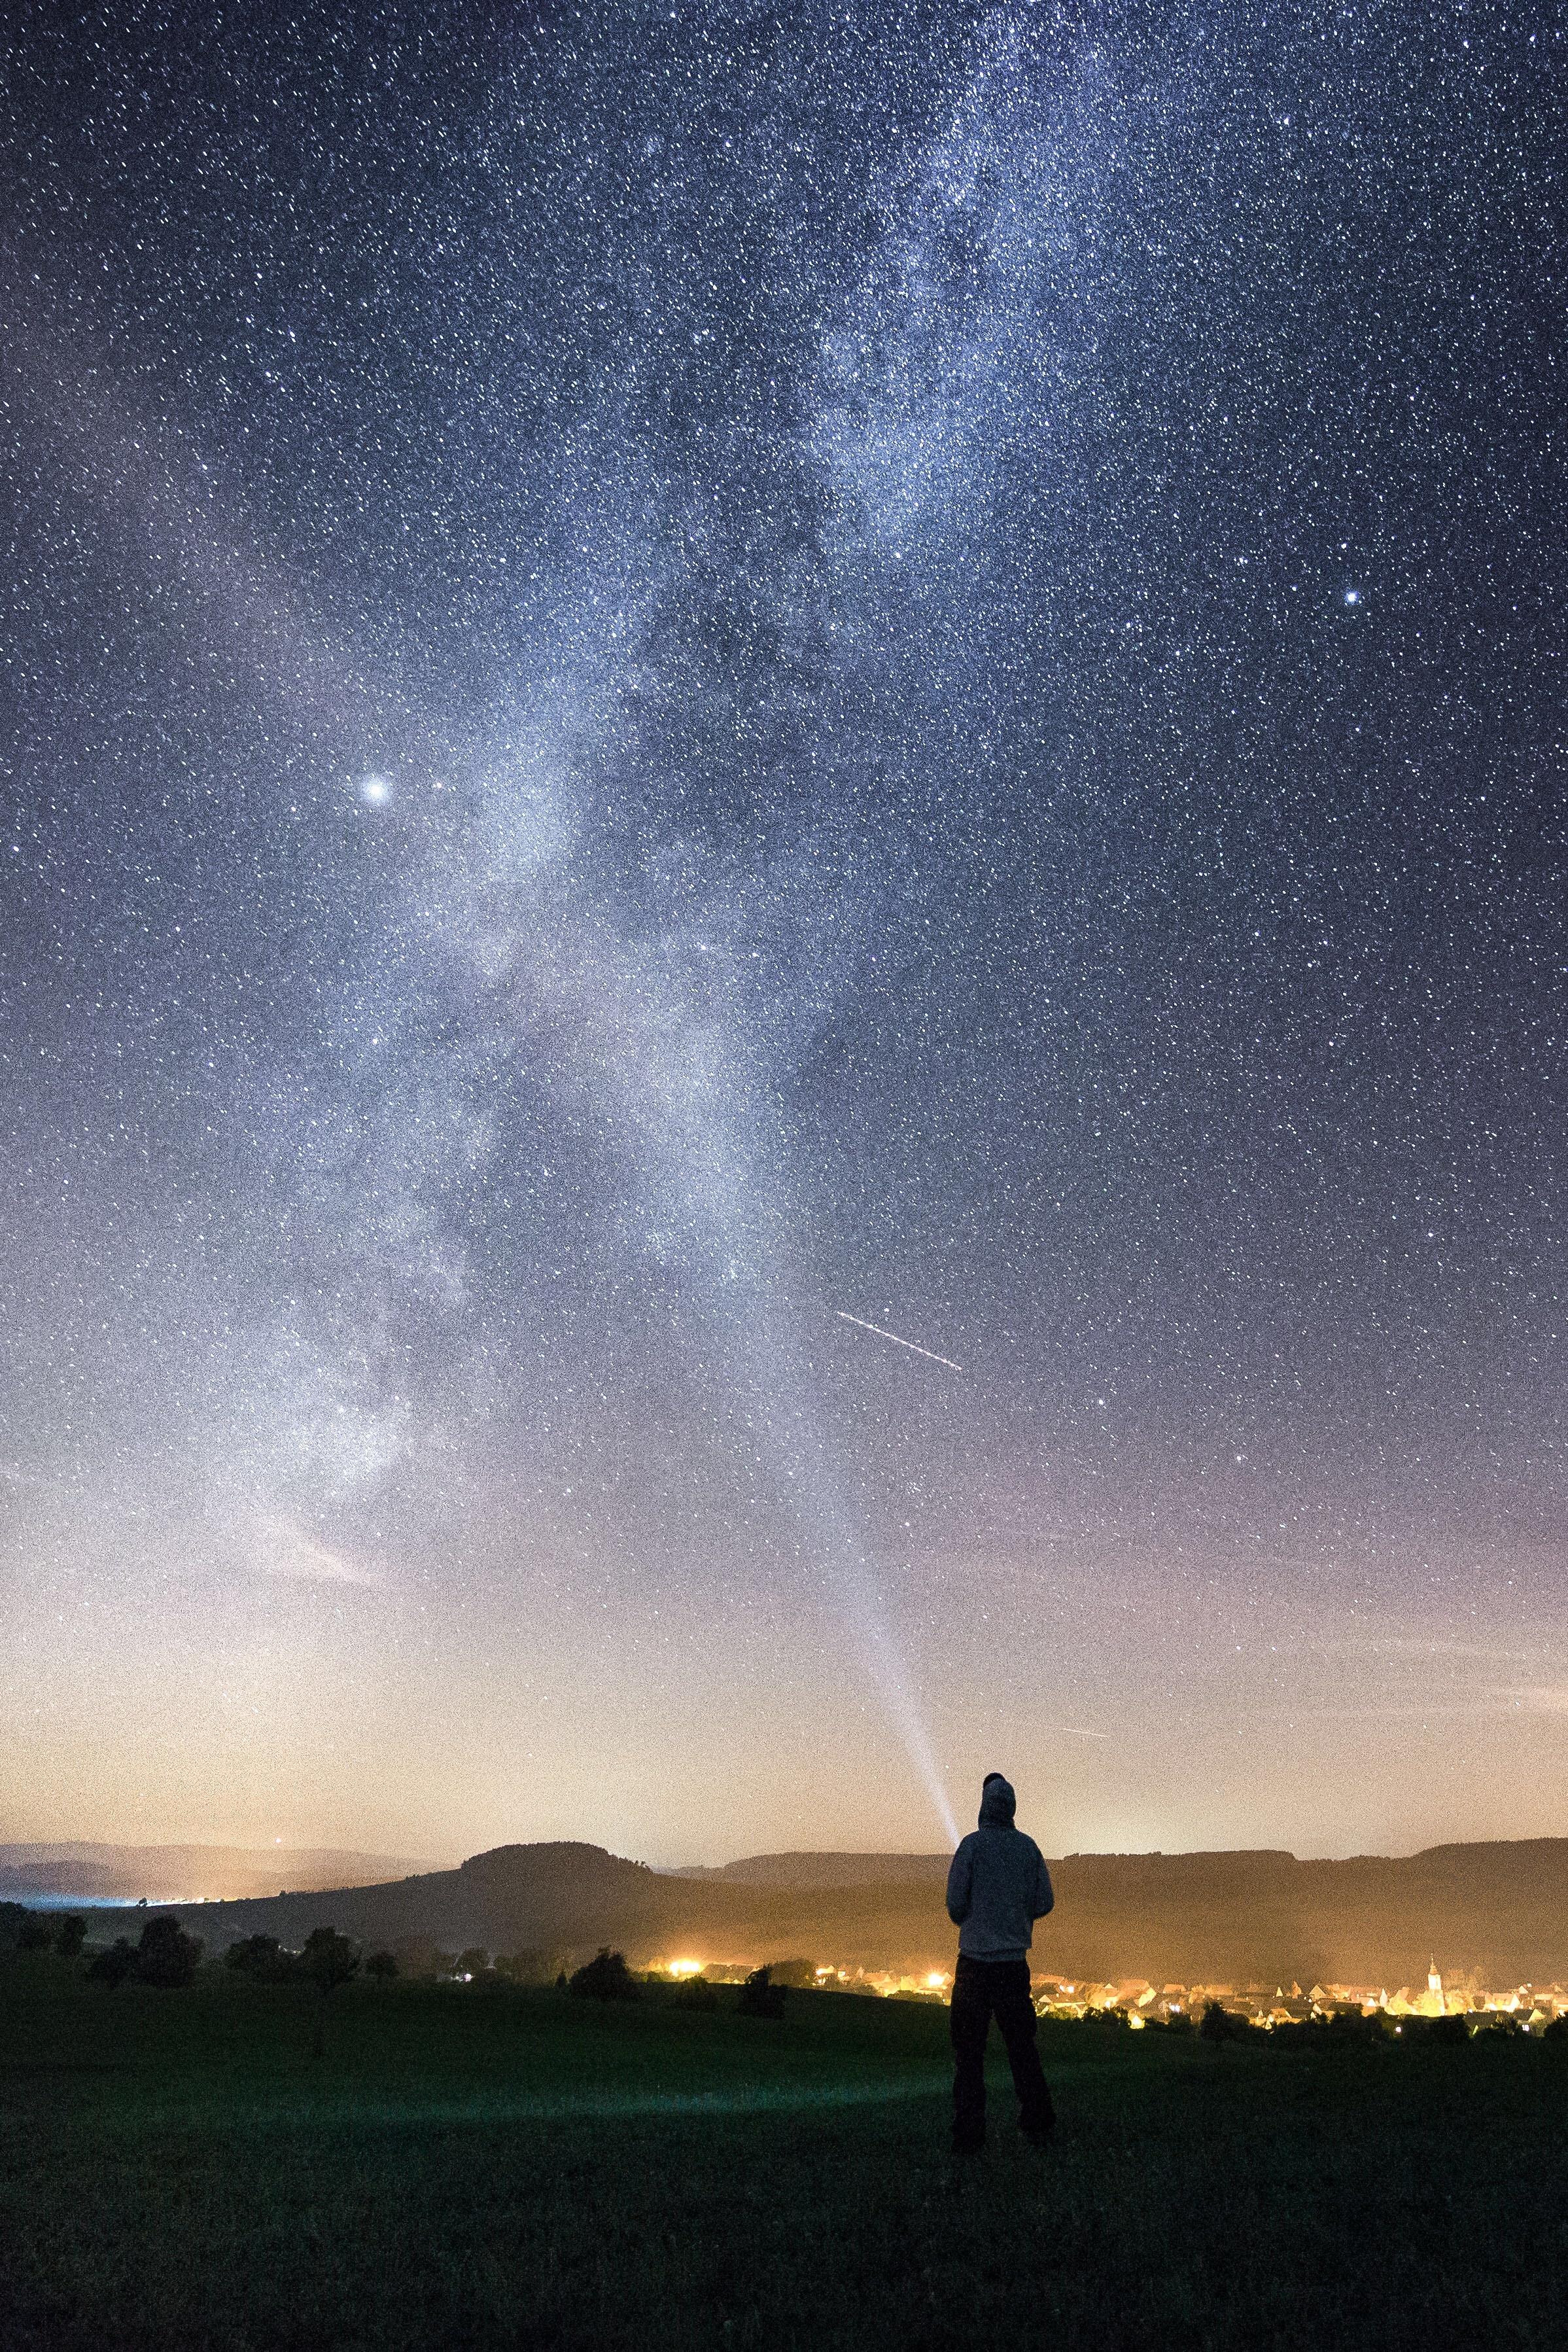 Free Images : sky, night, star, milky way, atmosphere